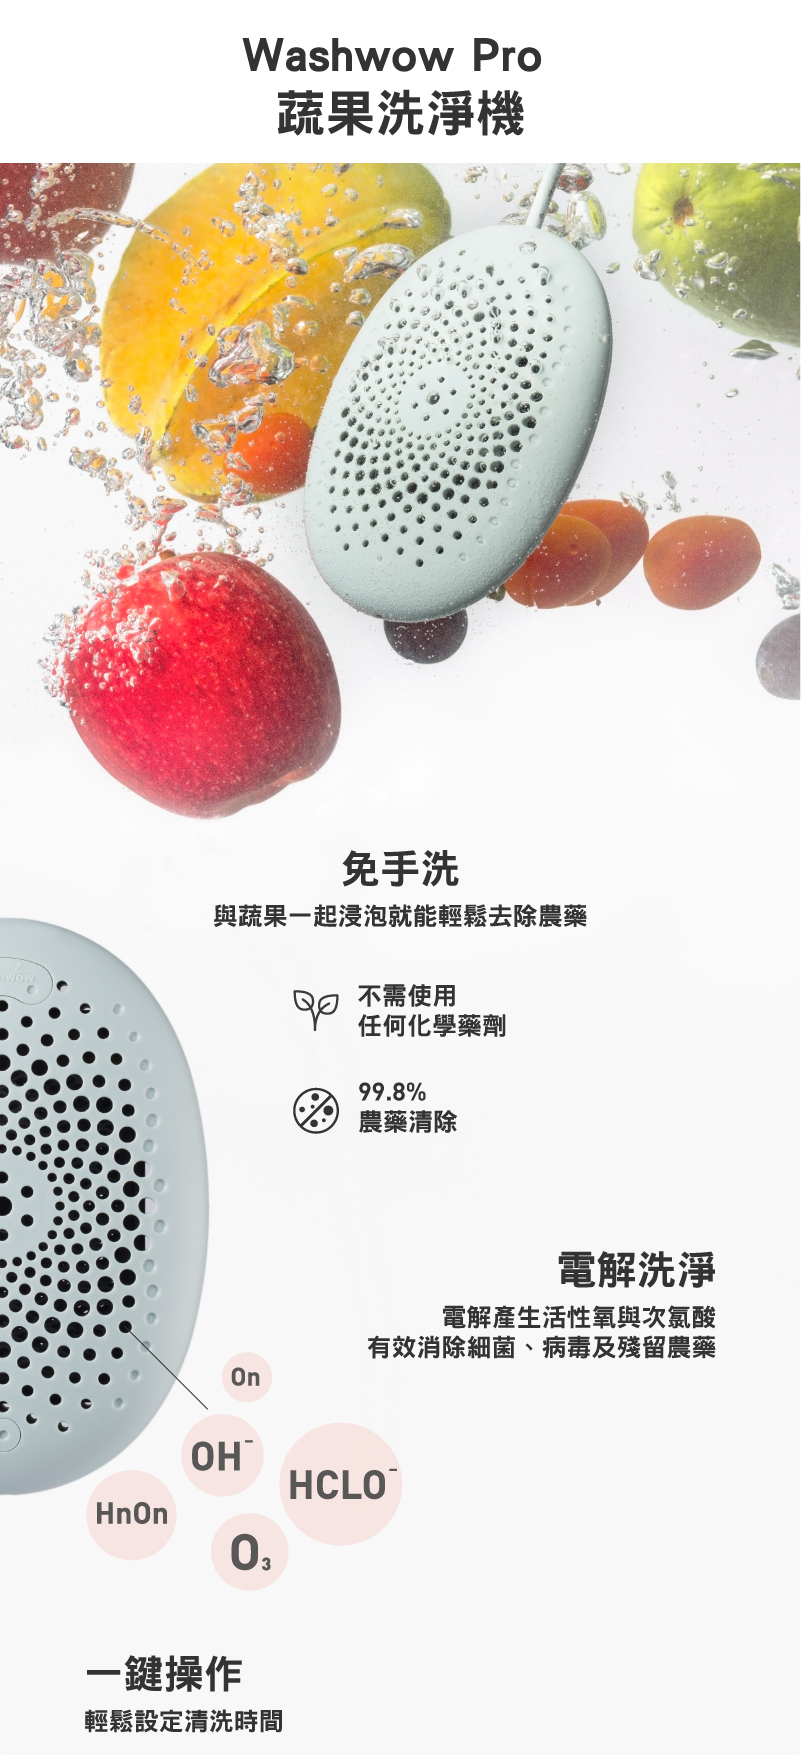 washwow pro_導購圖-2.jpg